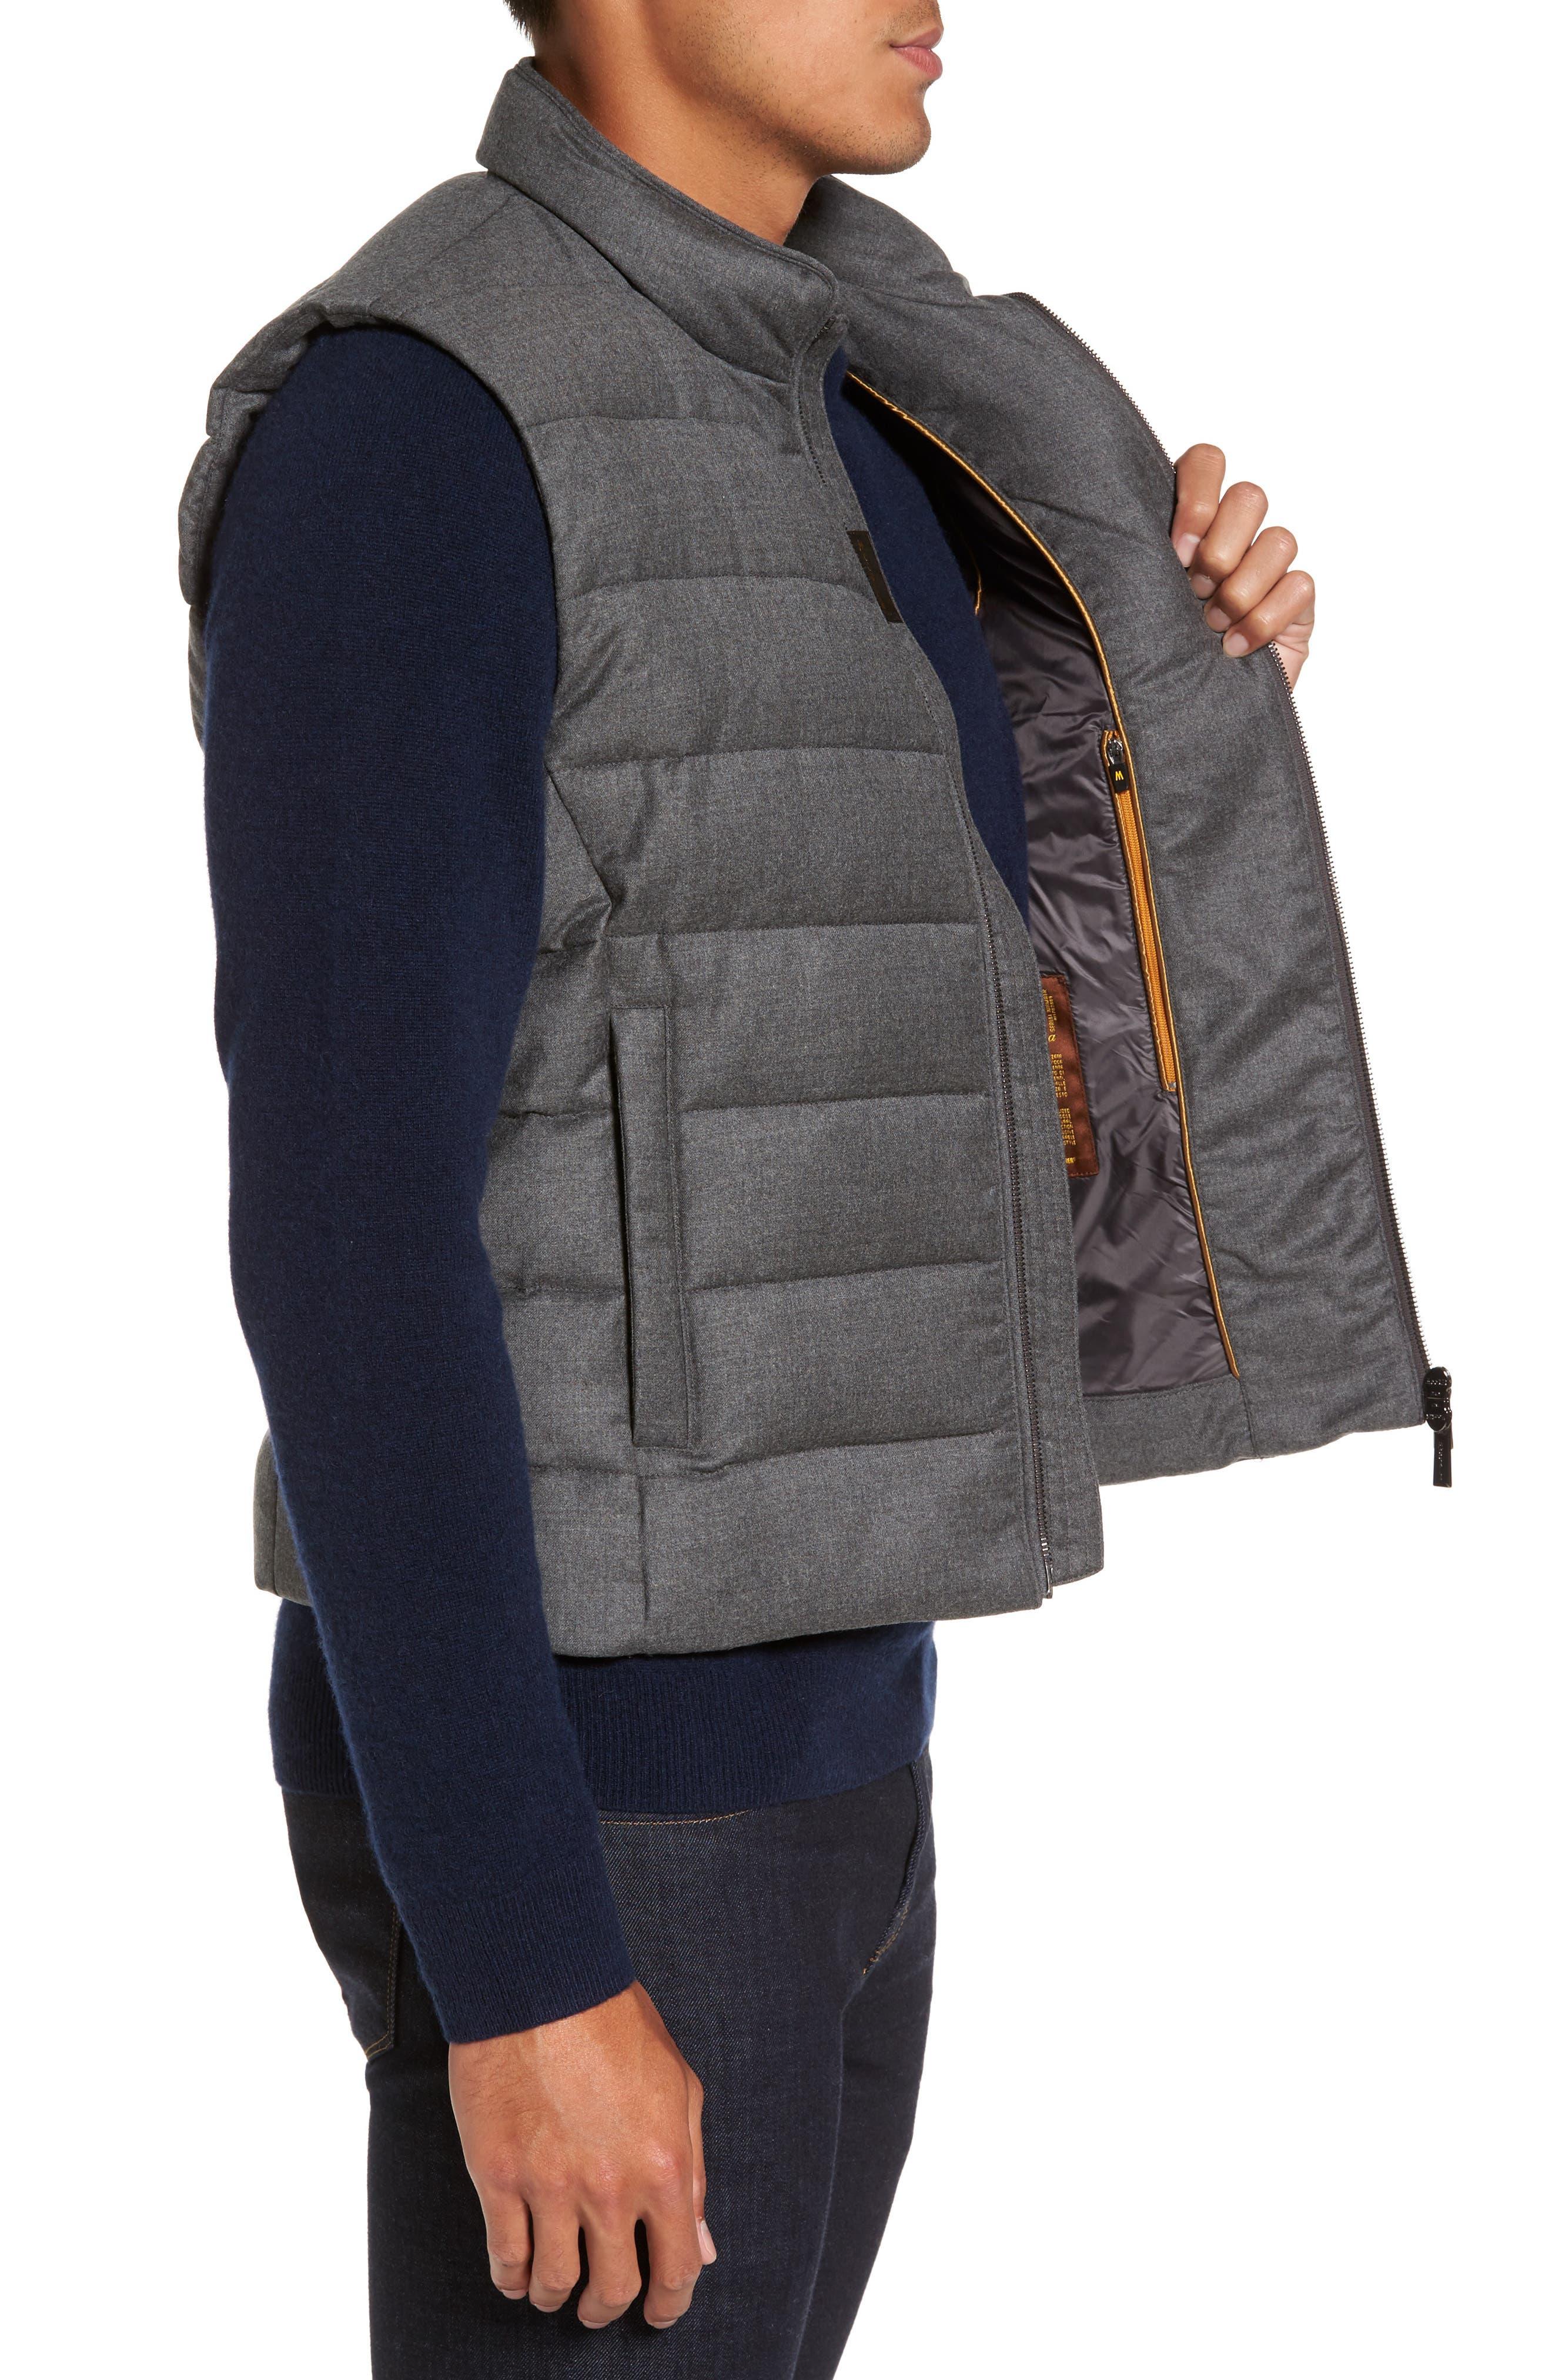 Oliver L Wool & Cashmere Flannel Waterproof Vest,                             Alternate thumbnail 3, color,                             030